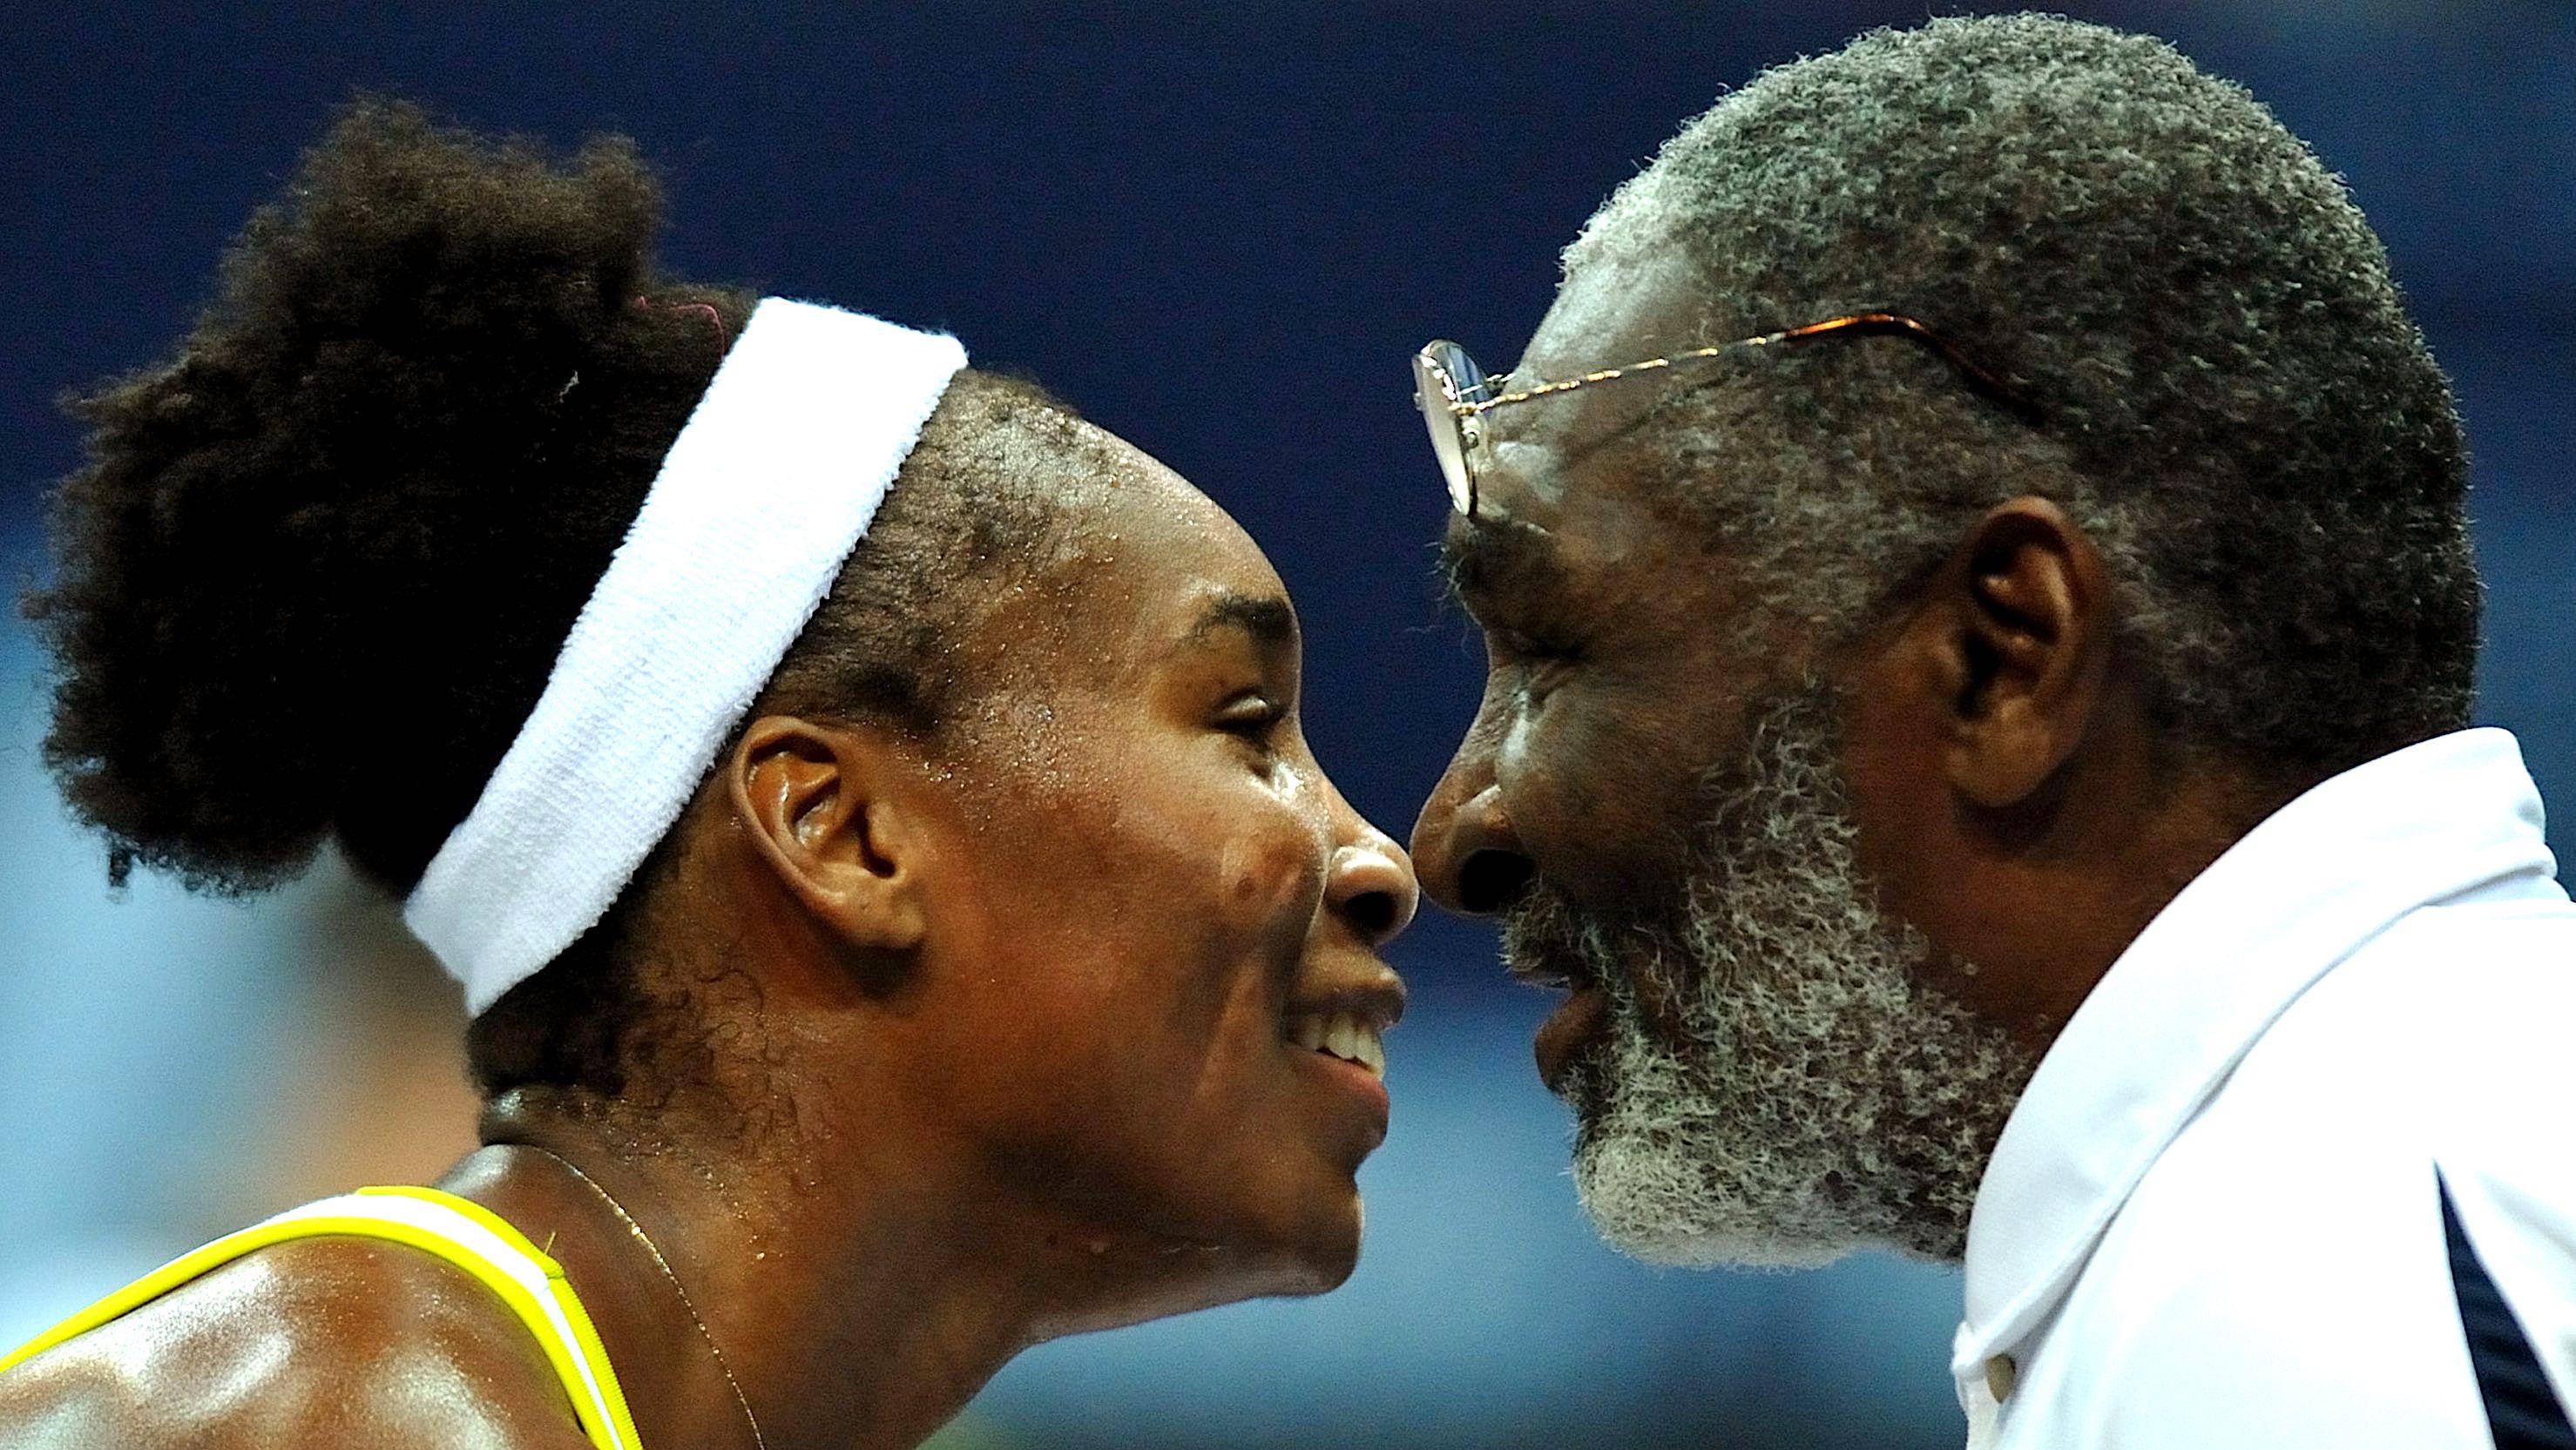 Serene Williams, Venus Williams, African American Athlete, Black Athlete, Richard Williams, KOLUMN Magazine, KOLUMN